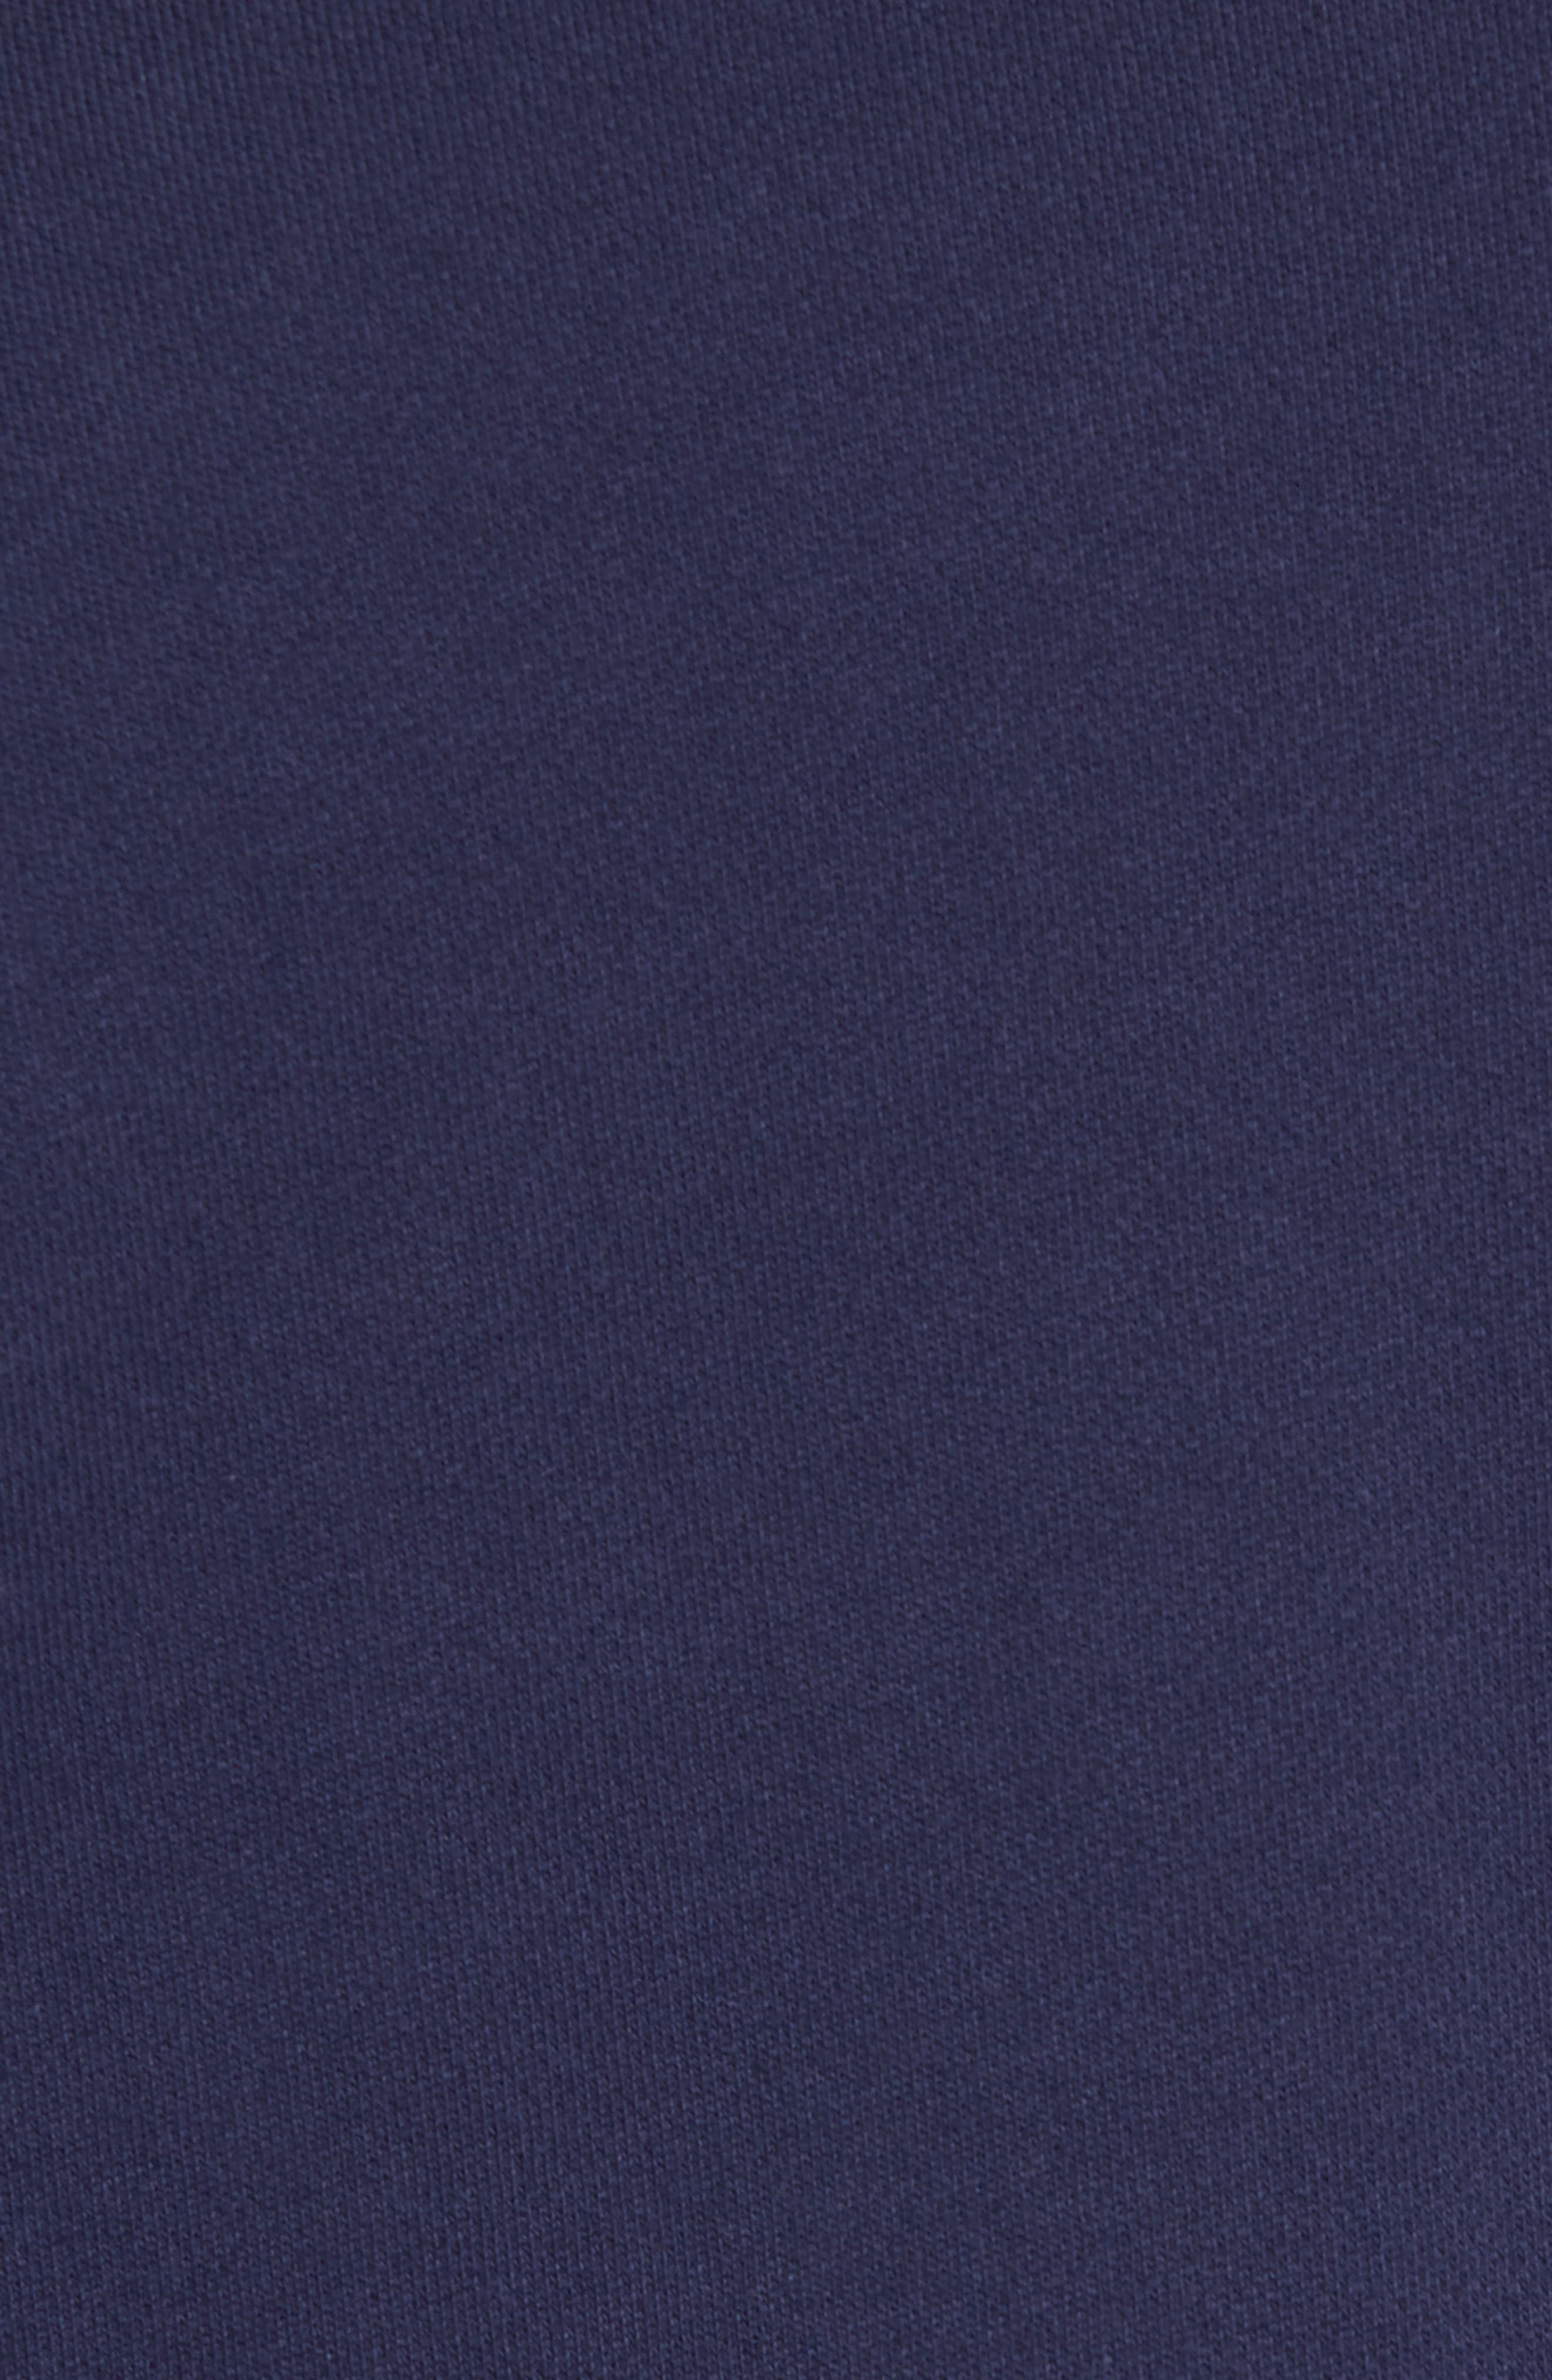 Hosmer Sweatshirt,                             Alternate thumbnail 5, color,                             400